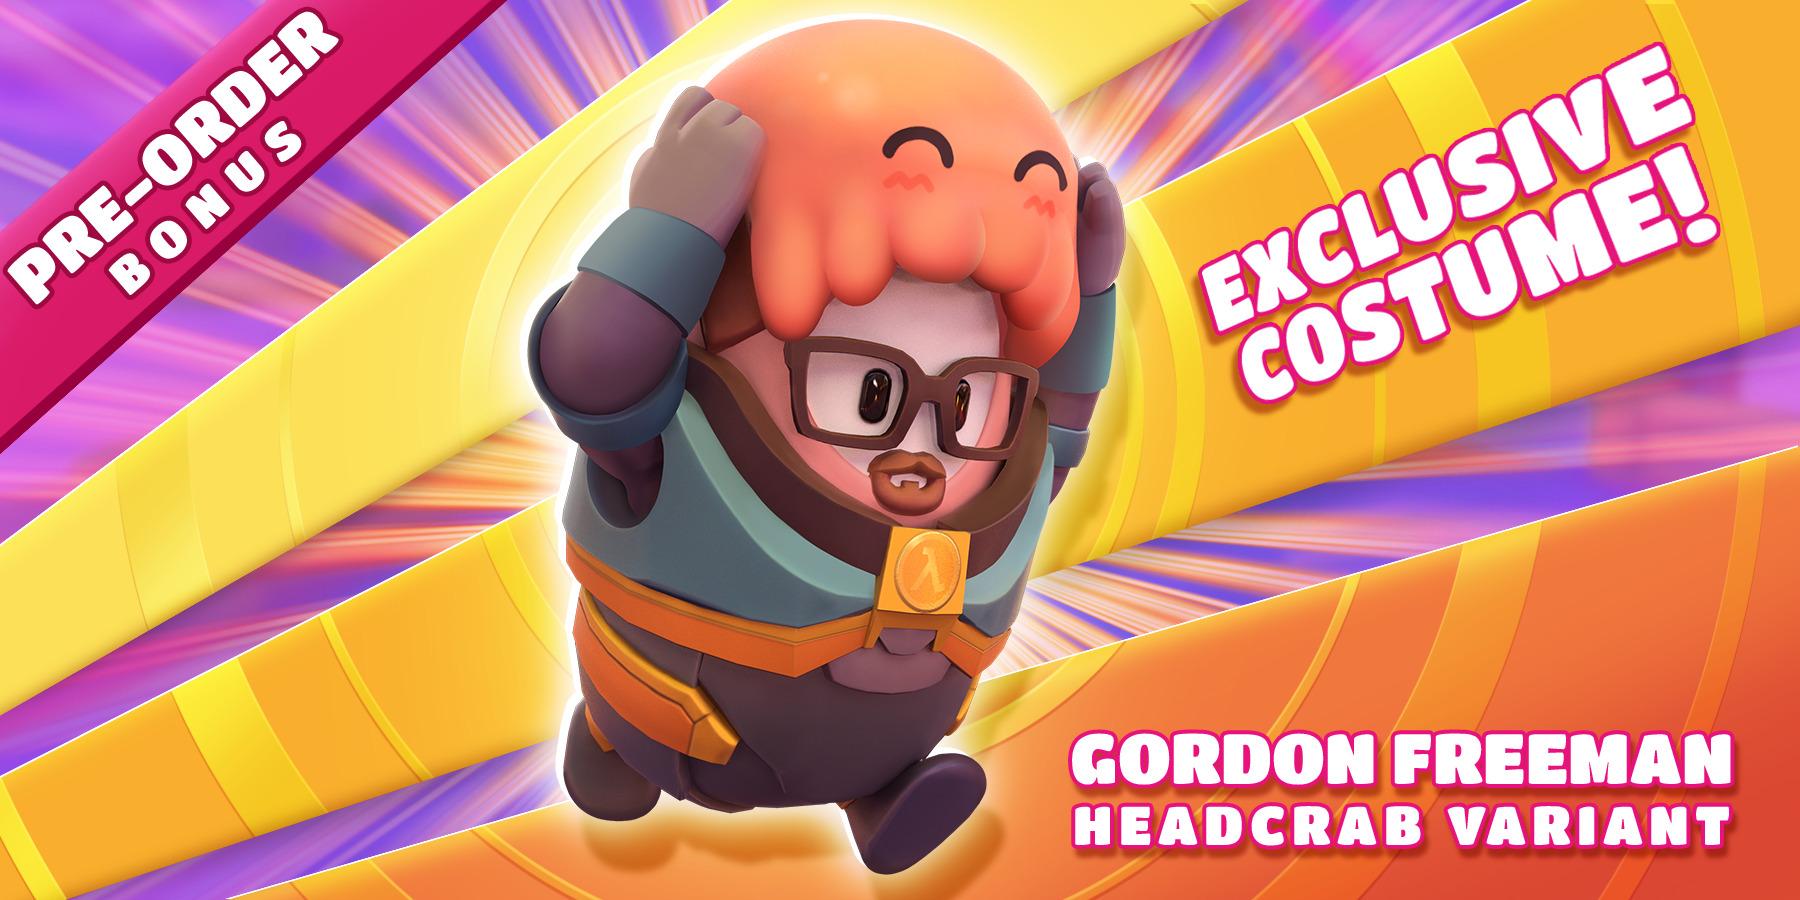 fall guys crossover skin gordon freeman headcrab